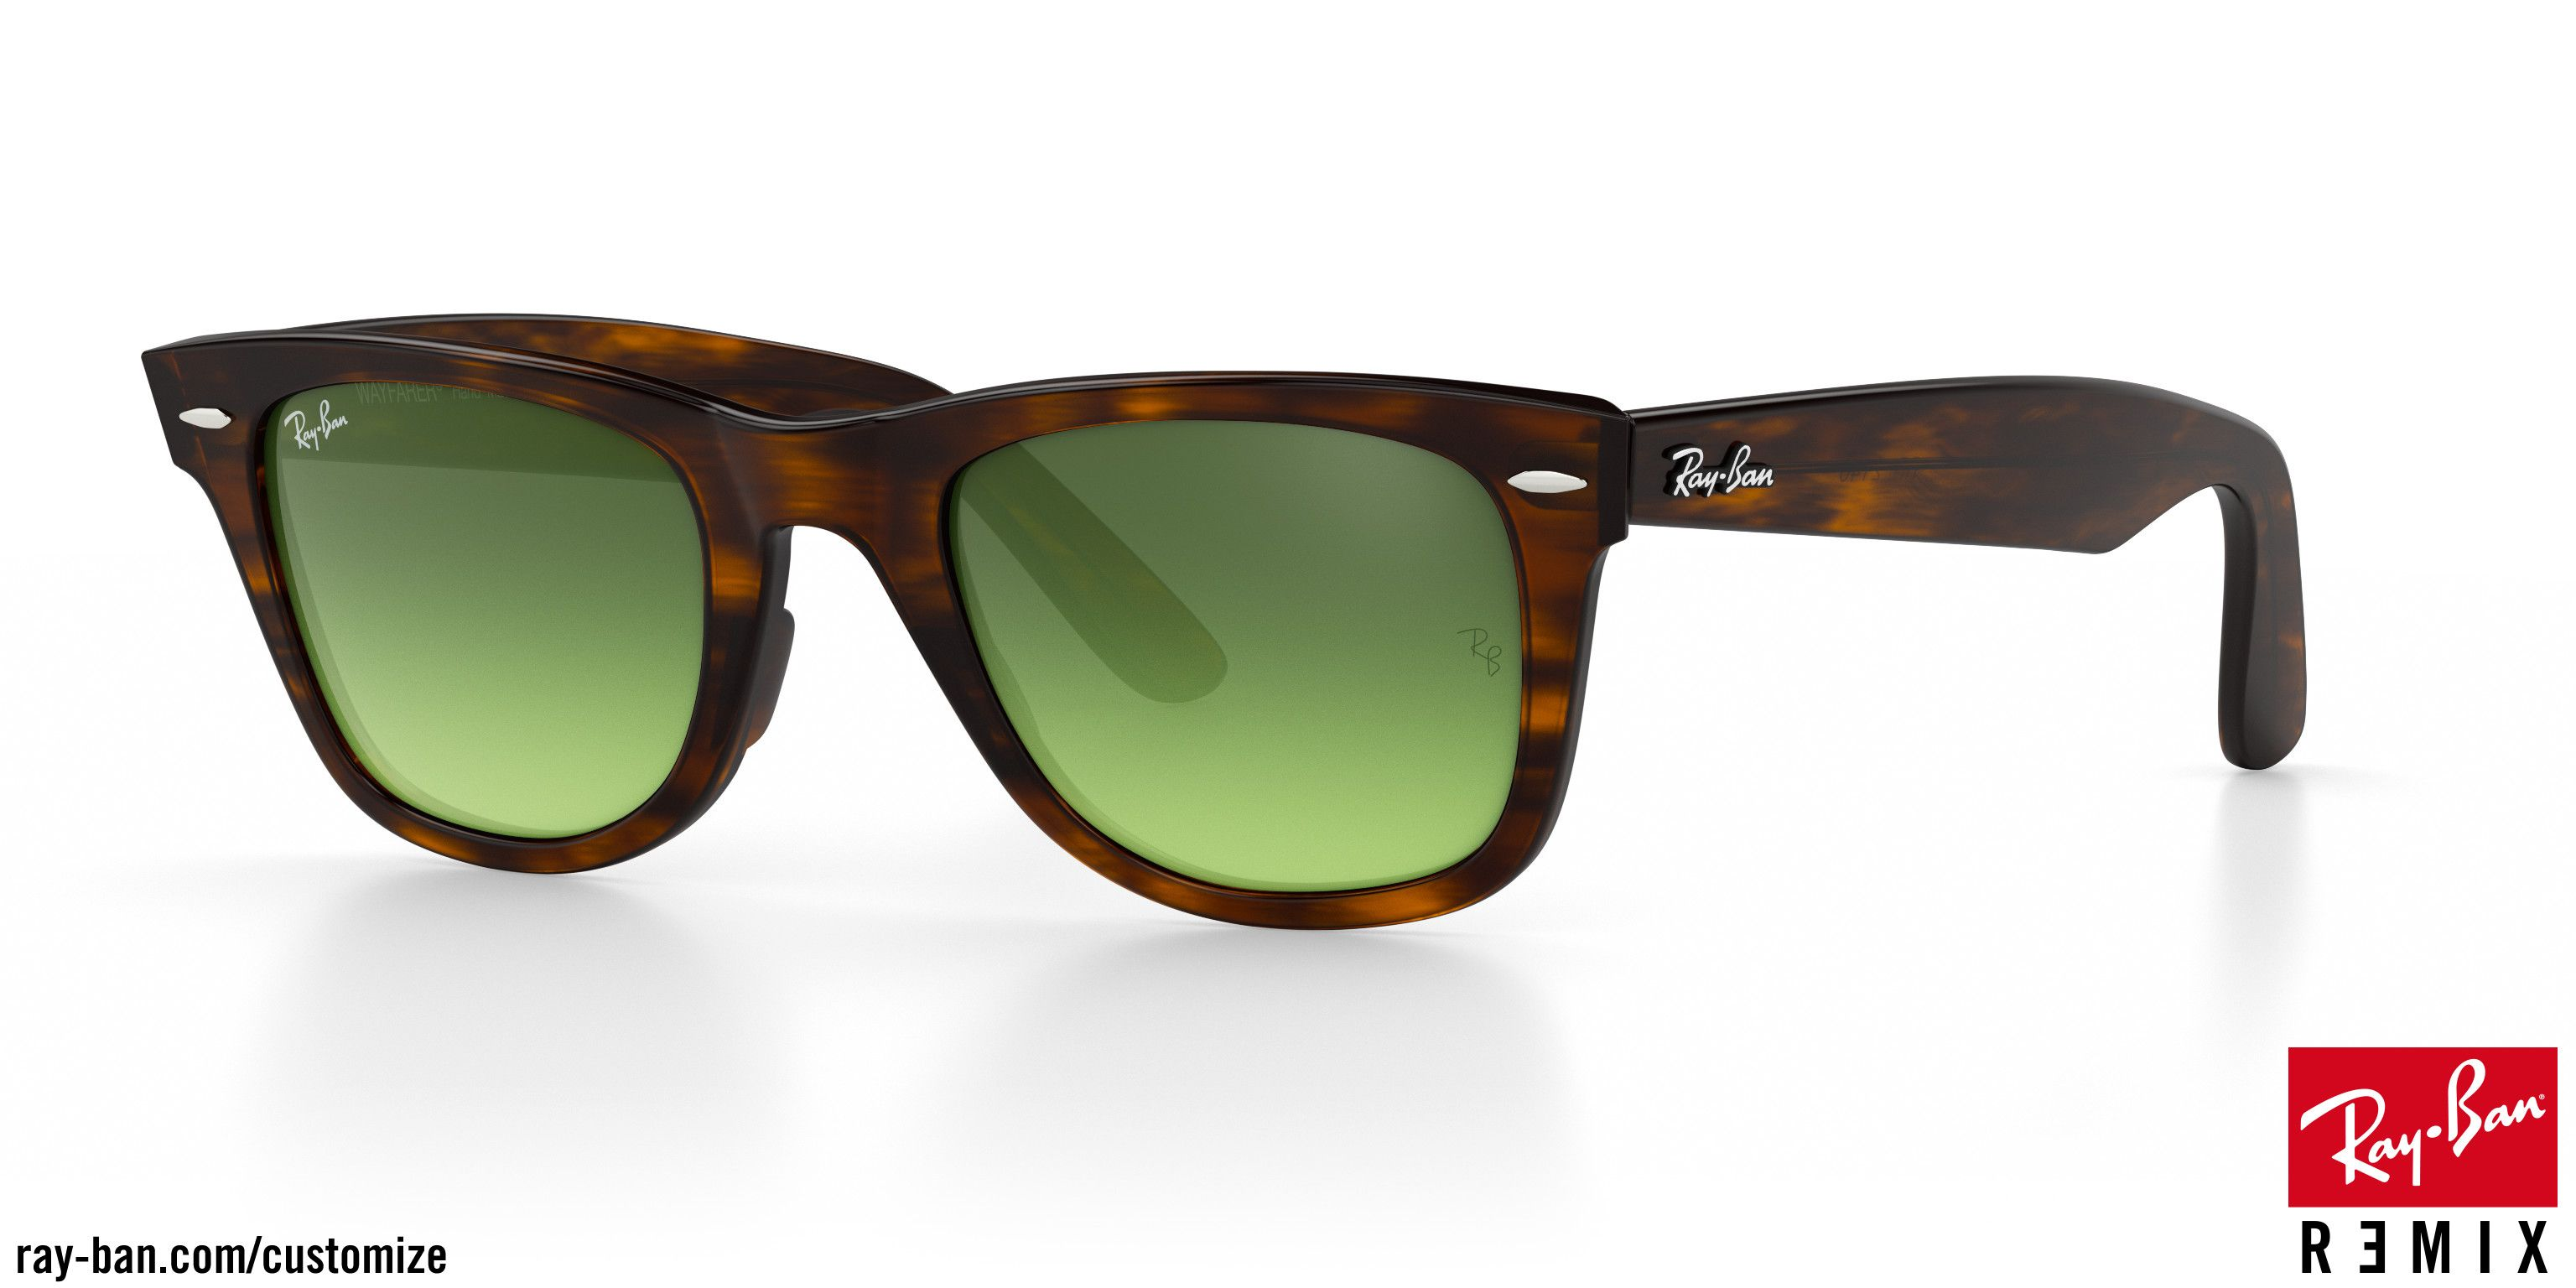 d0dfa2d4a5c32 Look whos looking at this new Ray-Ban original wayfarer sunglasses ...